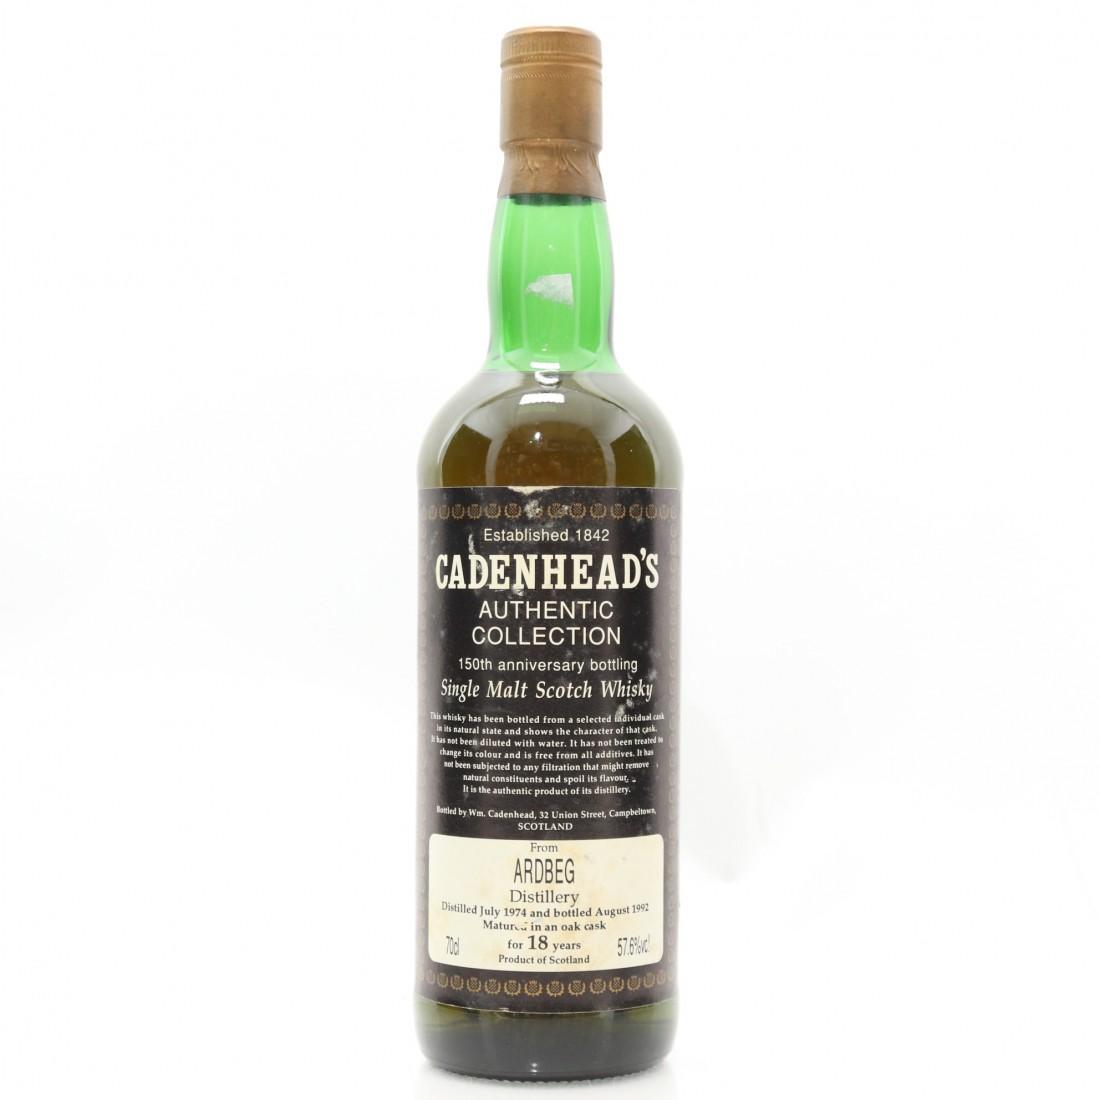 18 Year Old Cadenhead's, (distilled 1974)